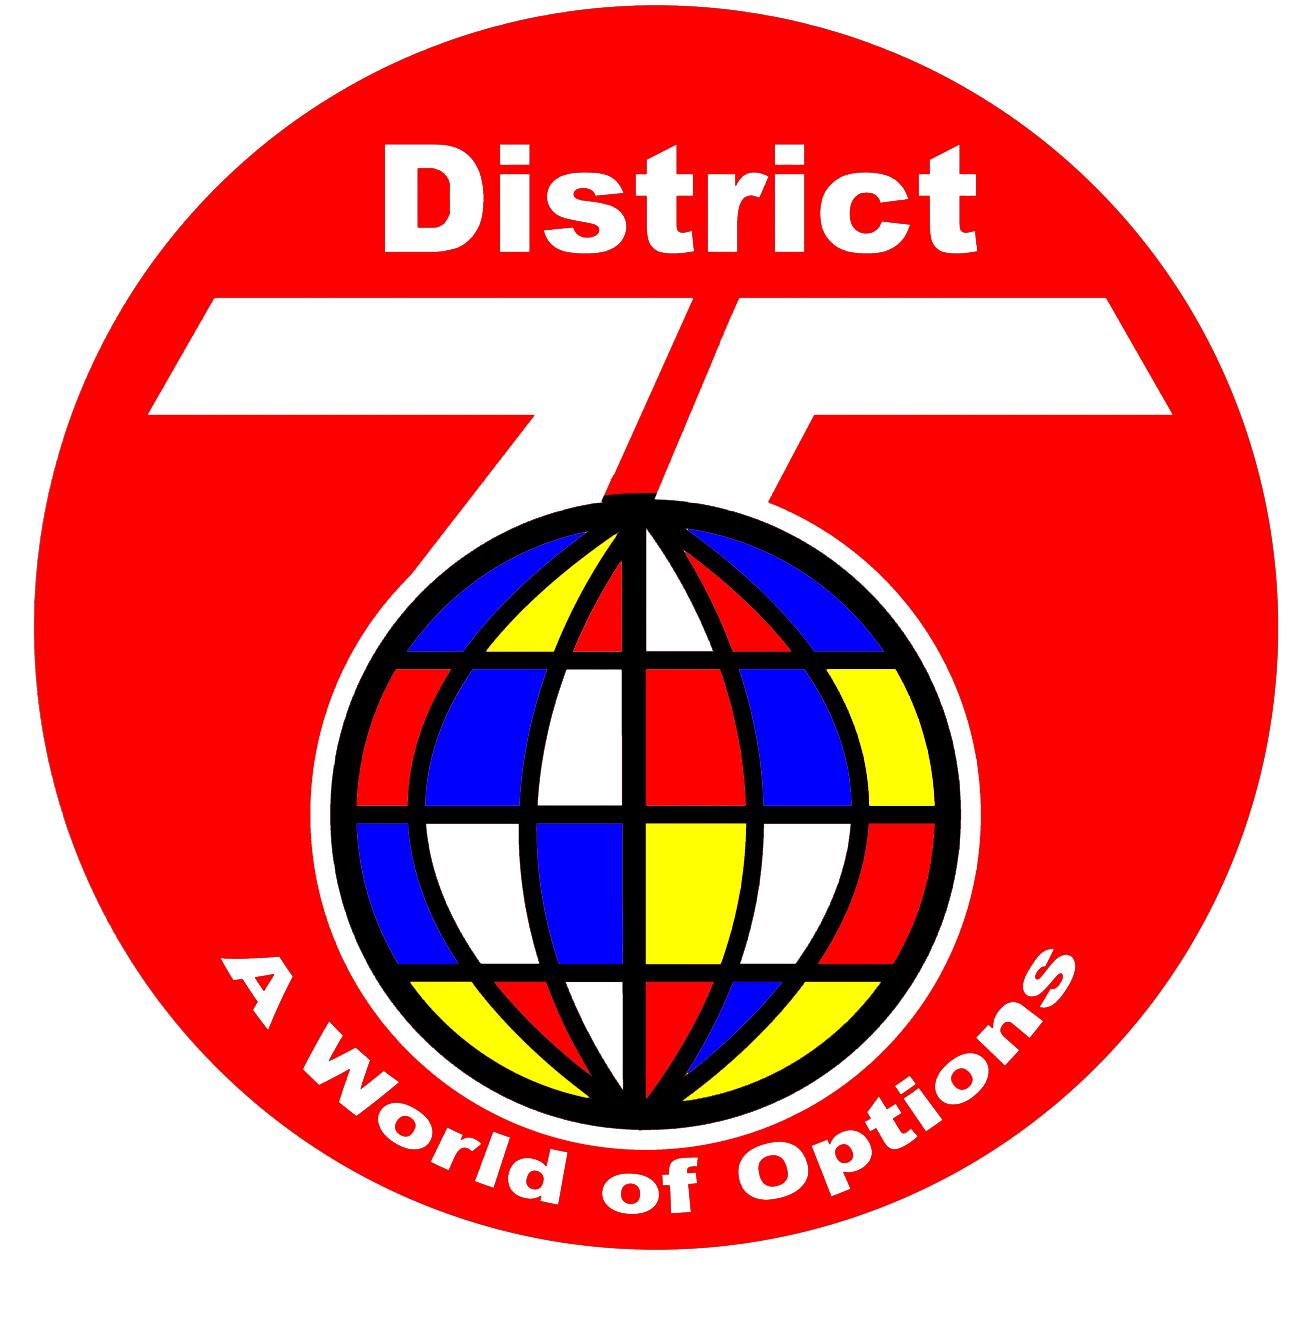 Chazs School Daze District 75 Schools Force Teachers To Teach